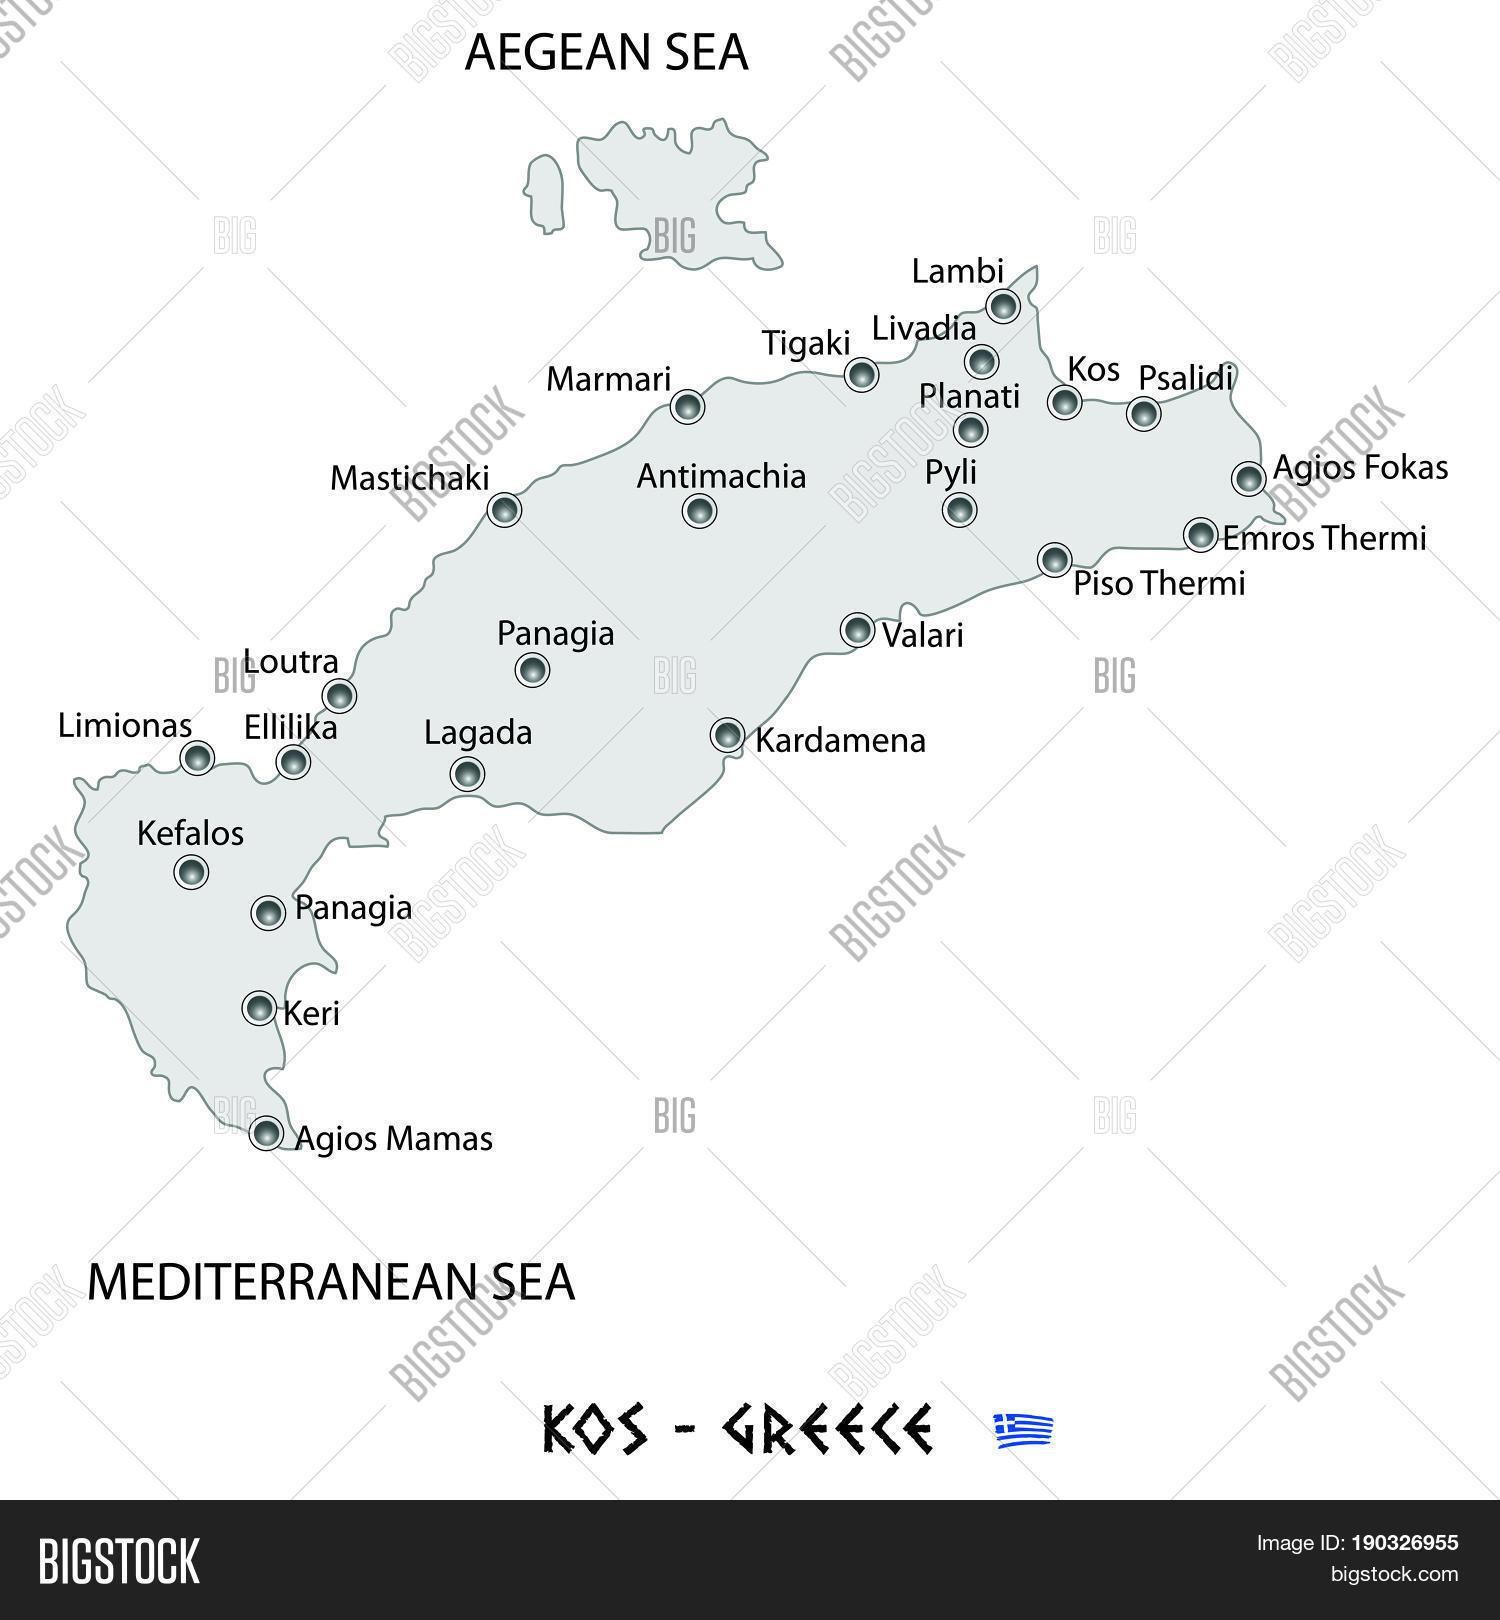 Island kos greece vector photo free trial bigstock island of kos in greece white map illustration gumiabroncs Gallery